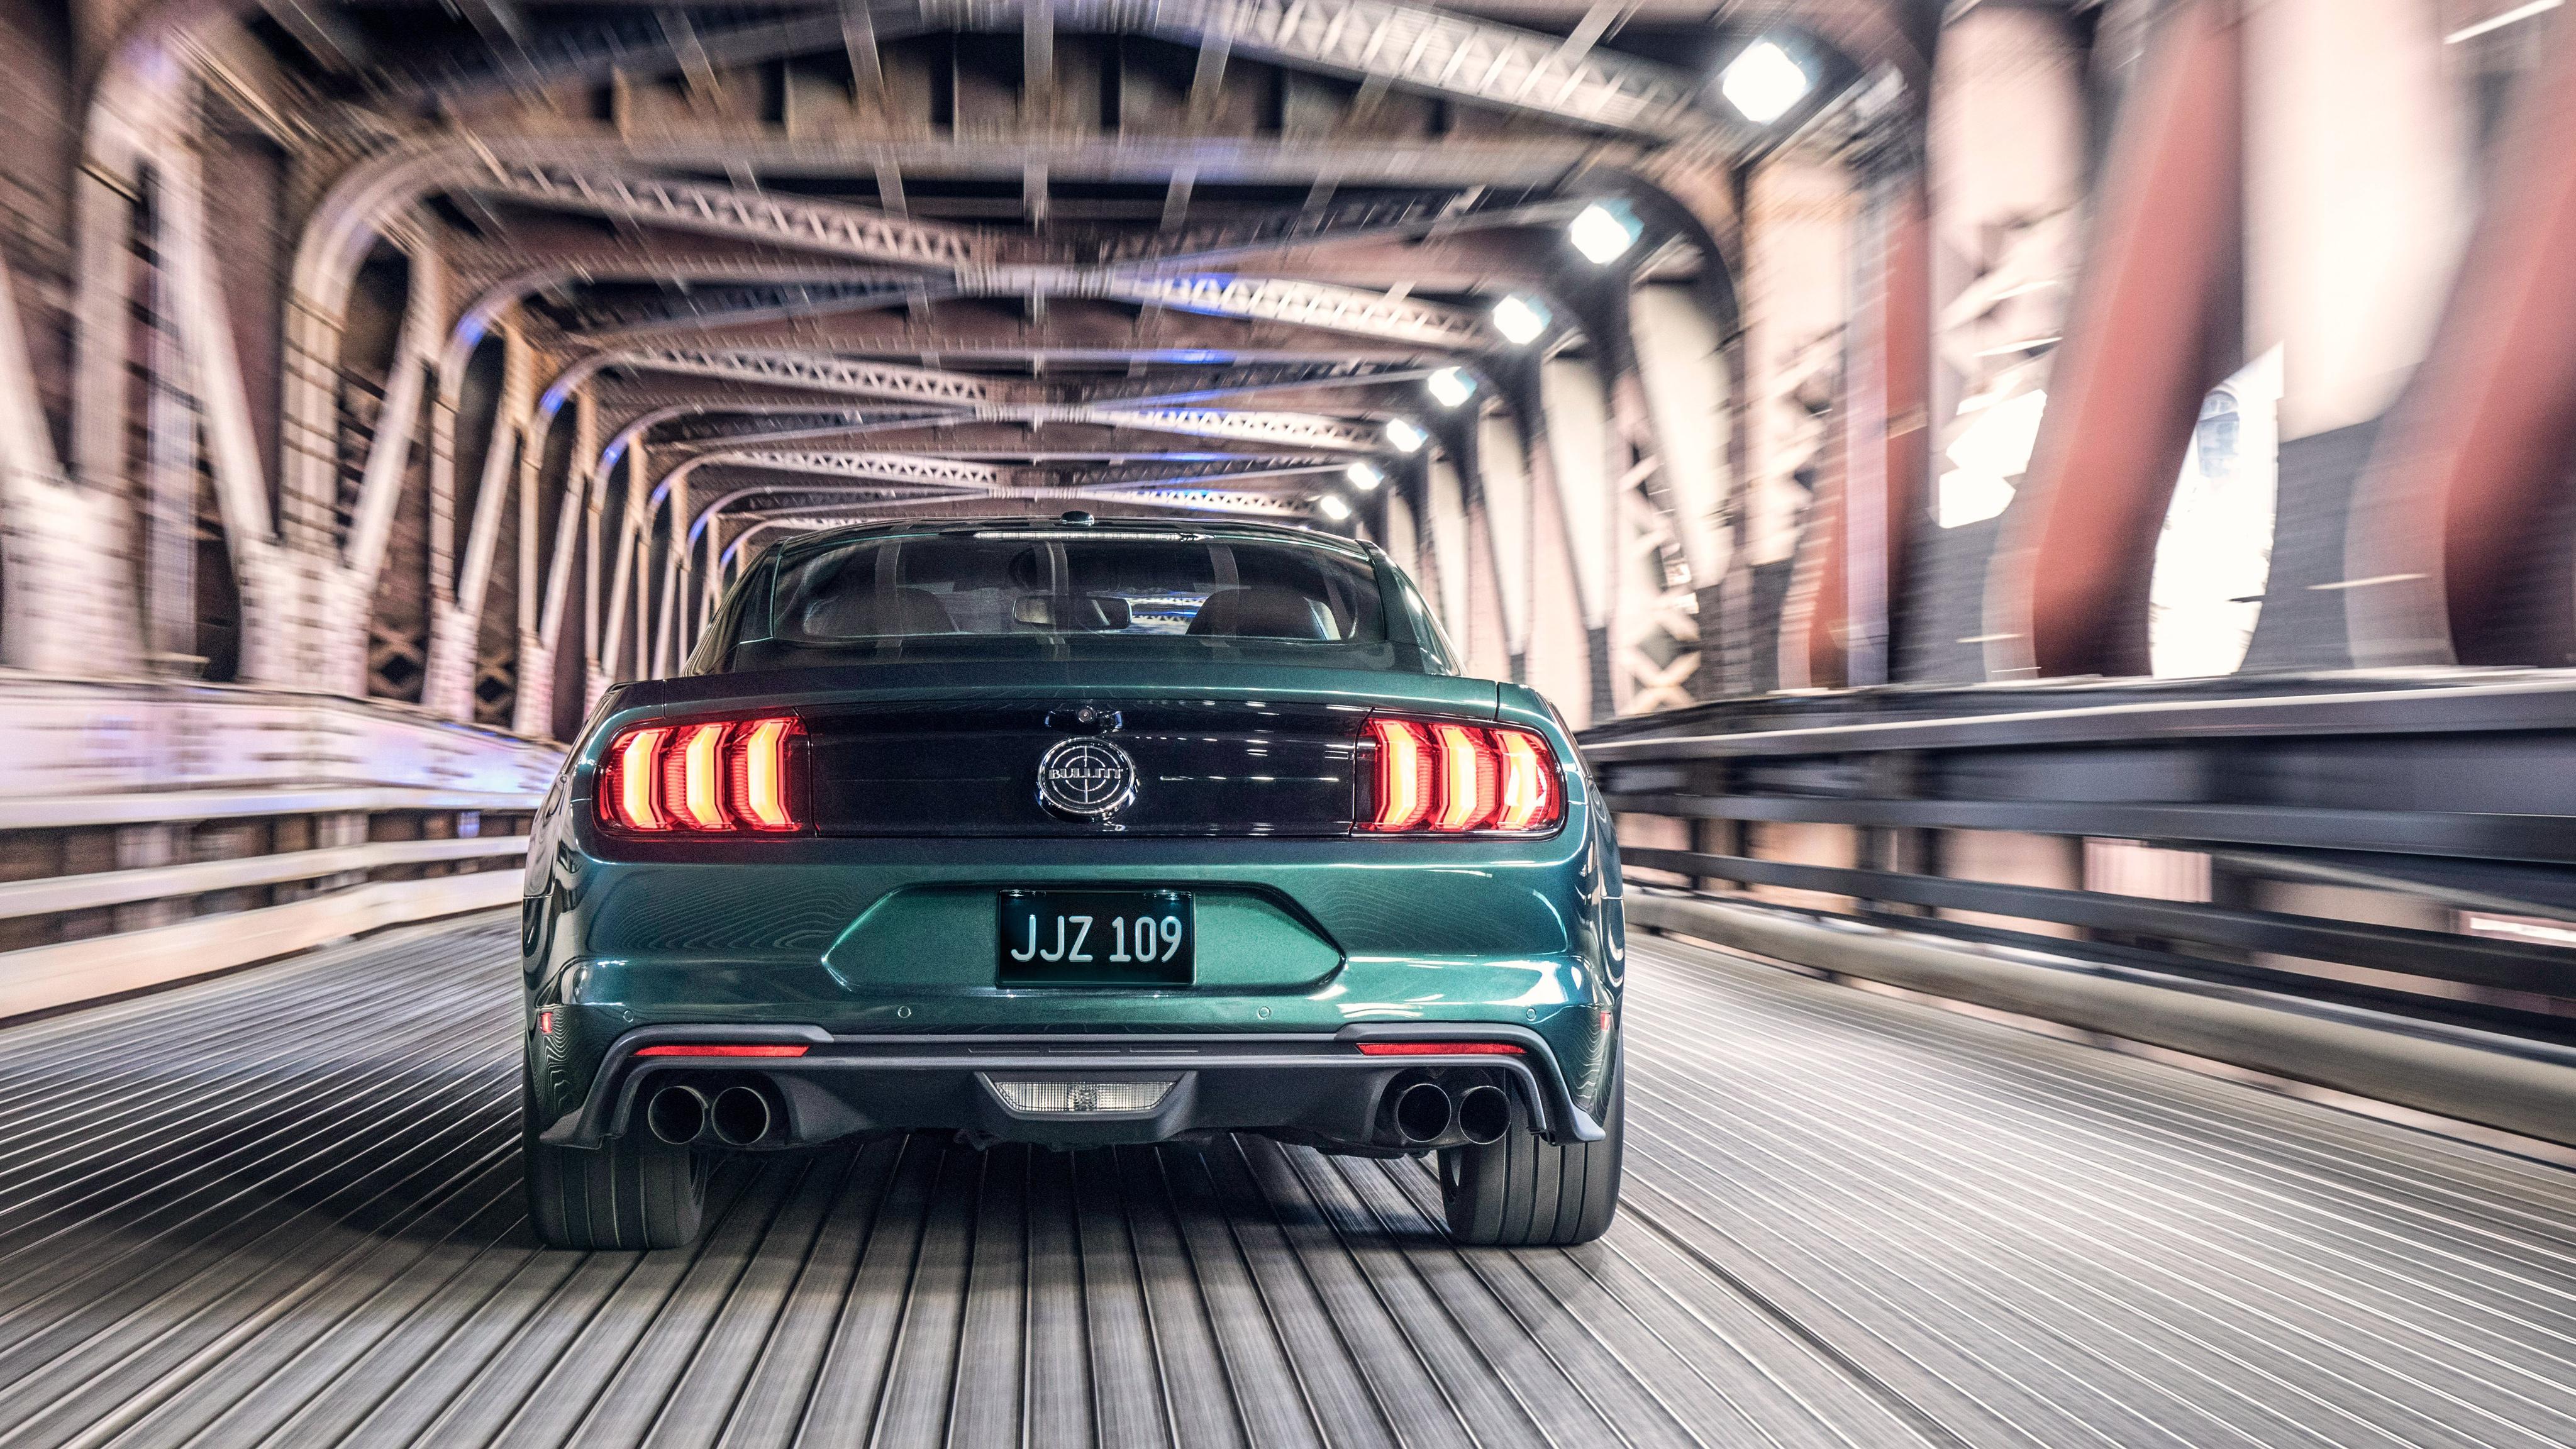 2019 Ford Mustang Bullitt 4k 2 Wallpaper Hd Car